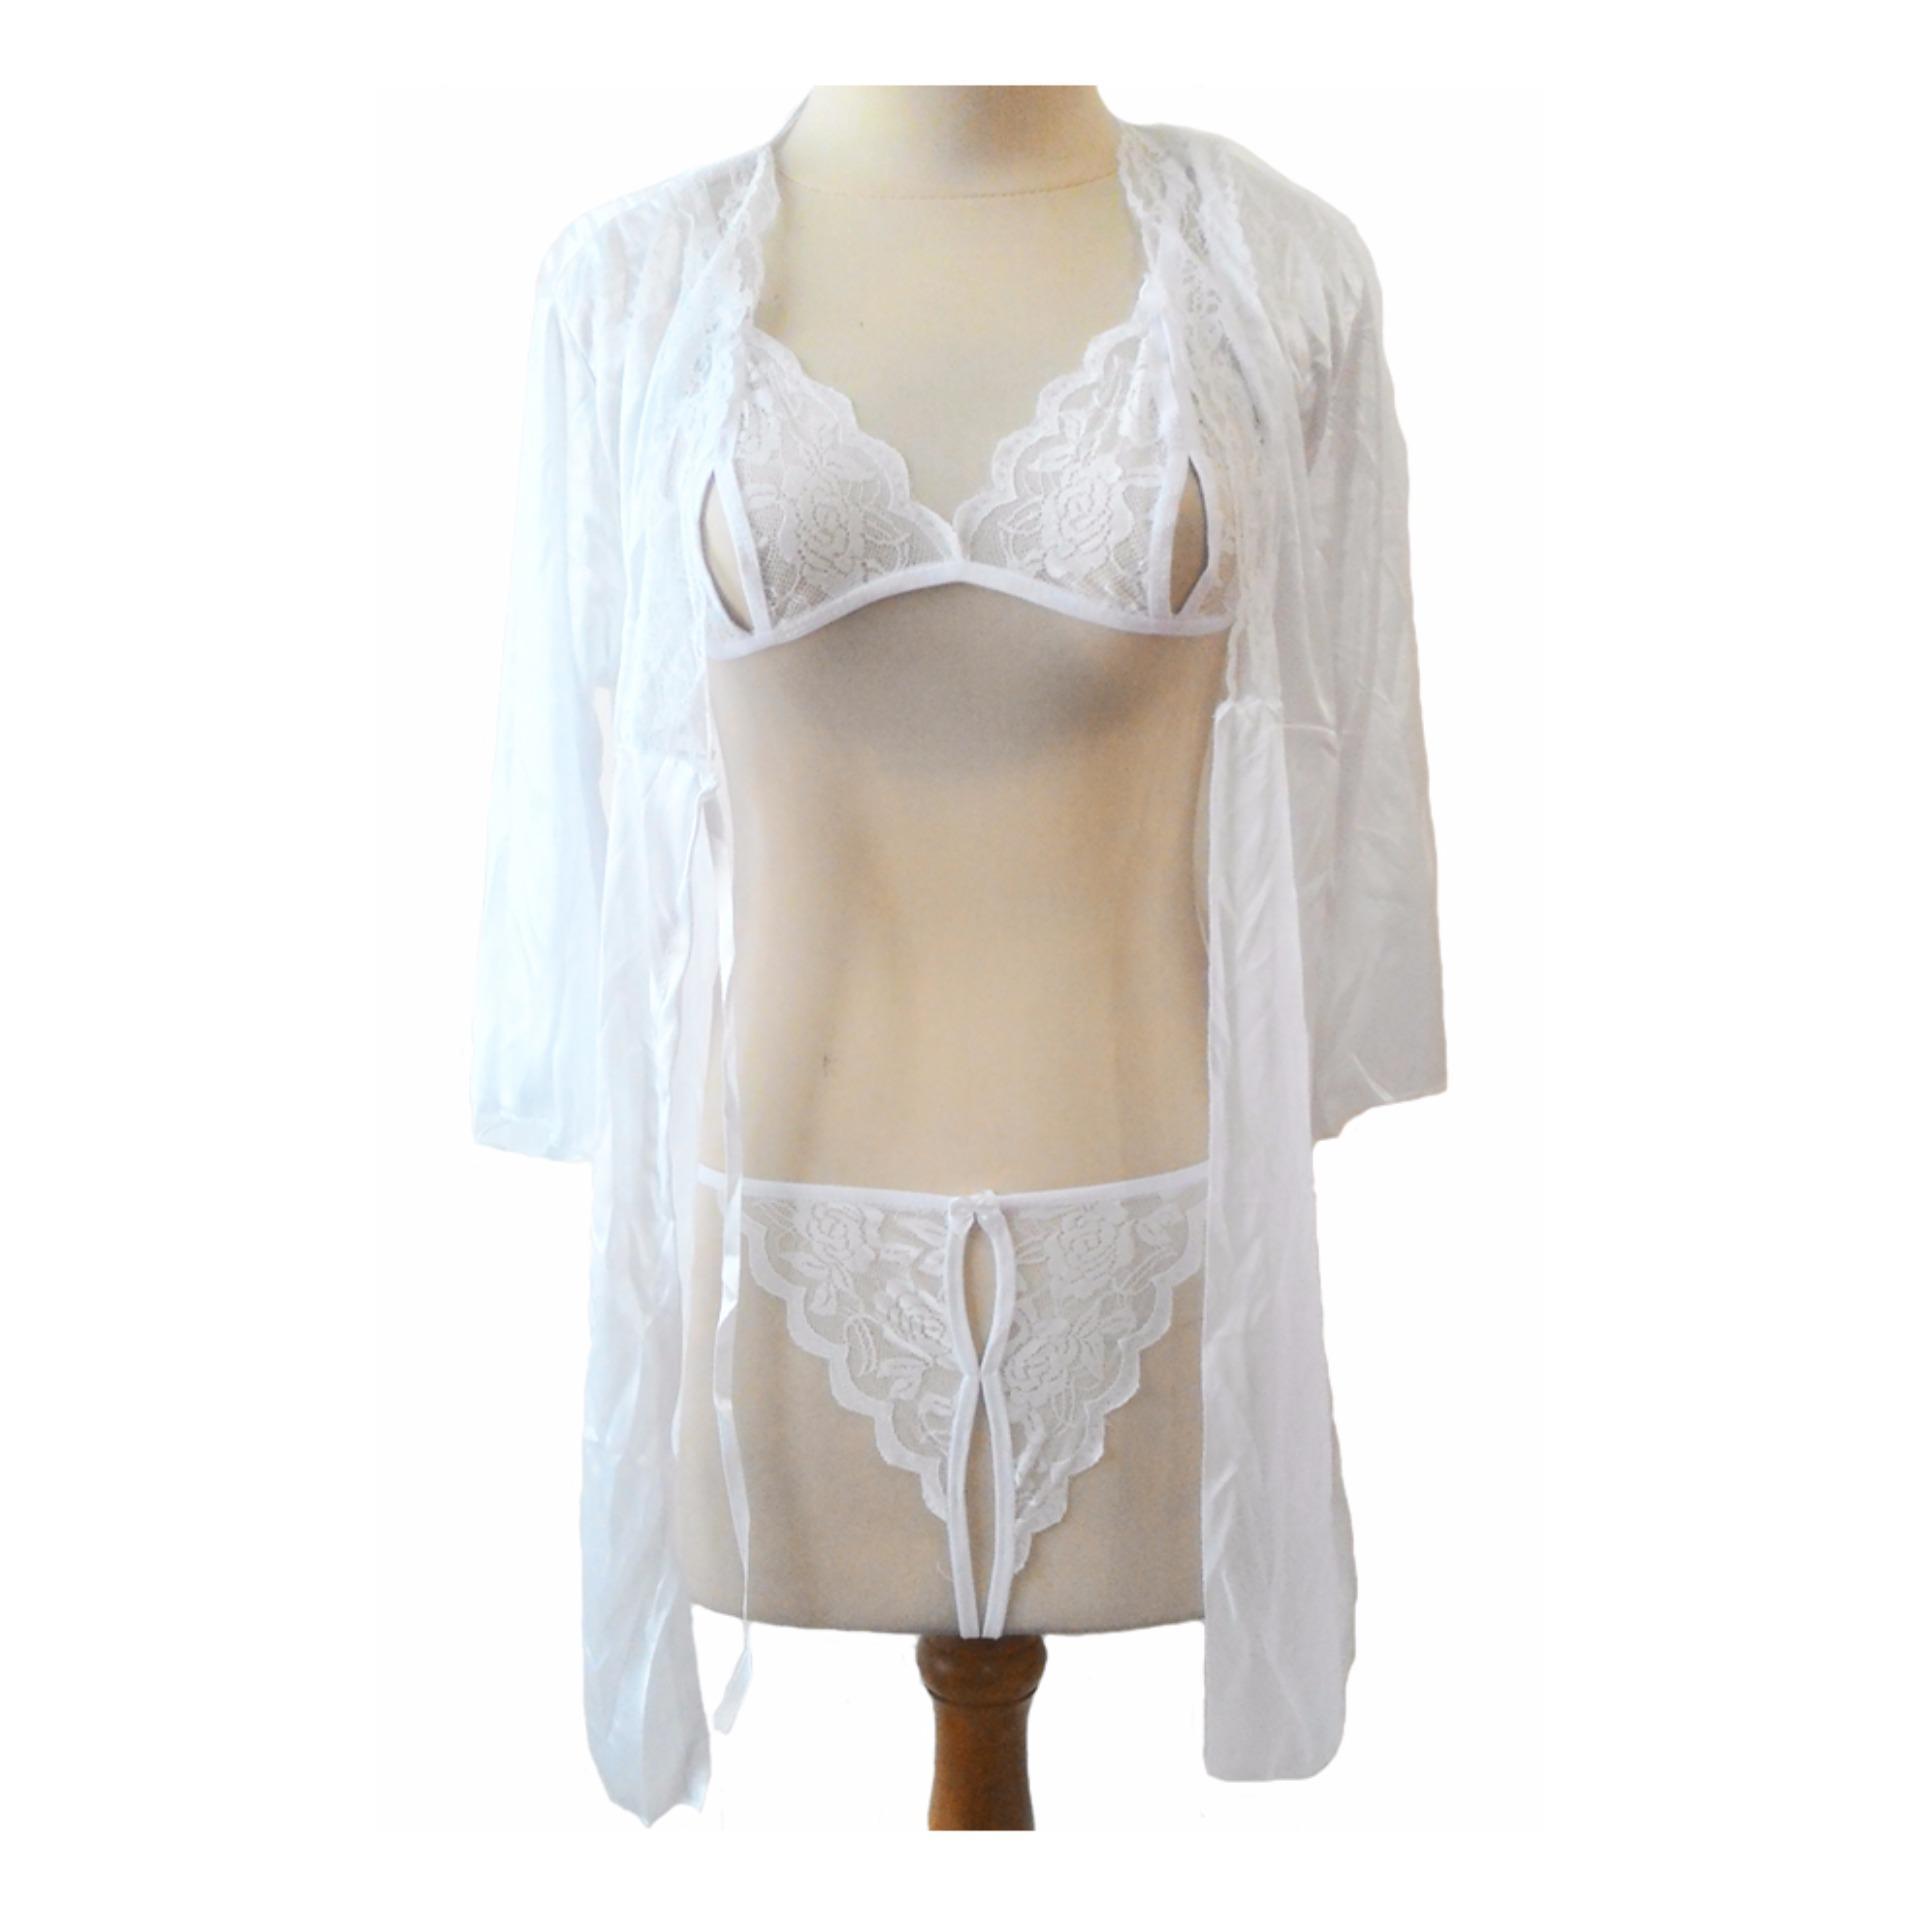 Spesifikasi Jakarta Lingerie Jld056 Fullset 3In1 Kimono White Open Crotch Paling Bagus